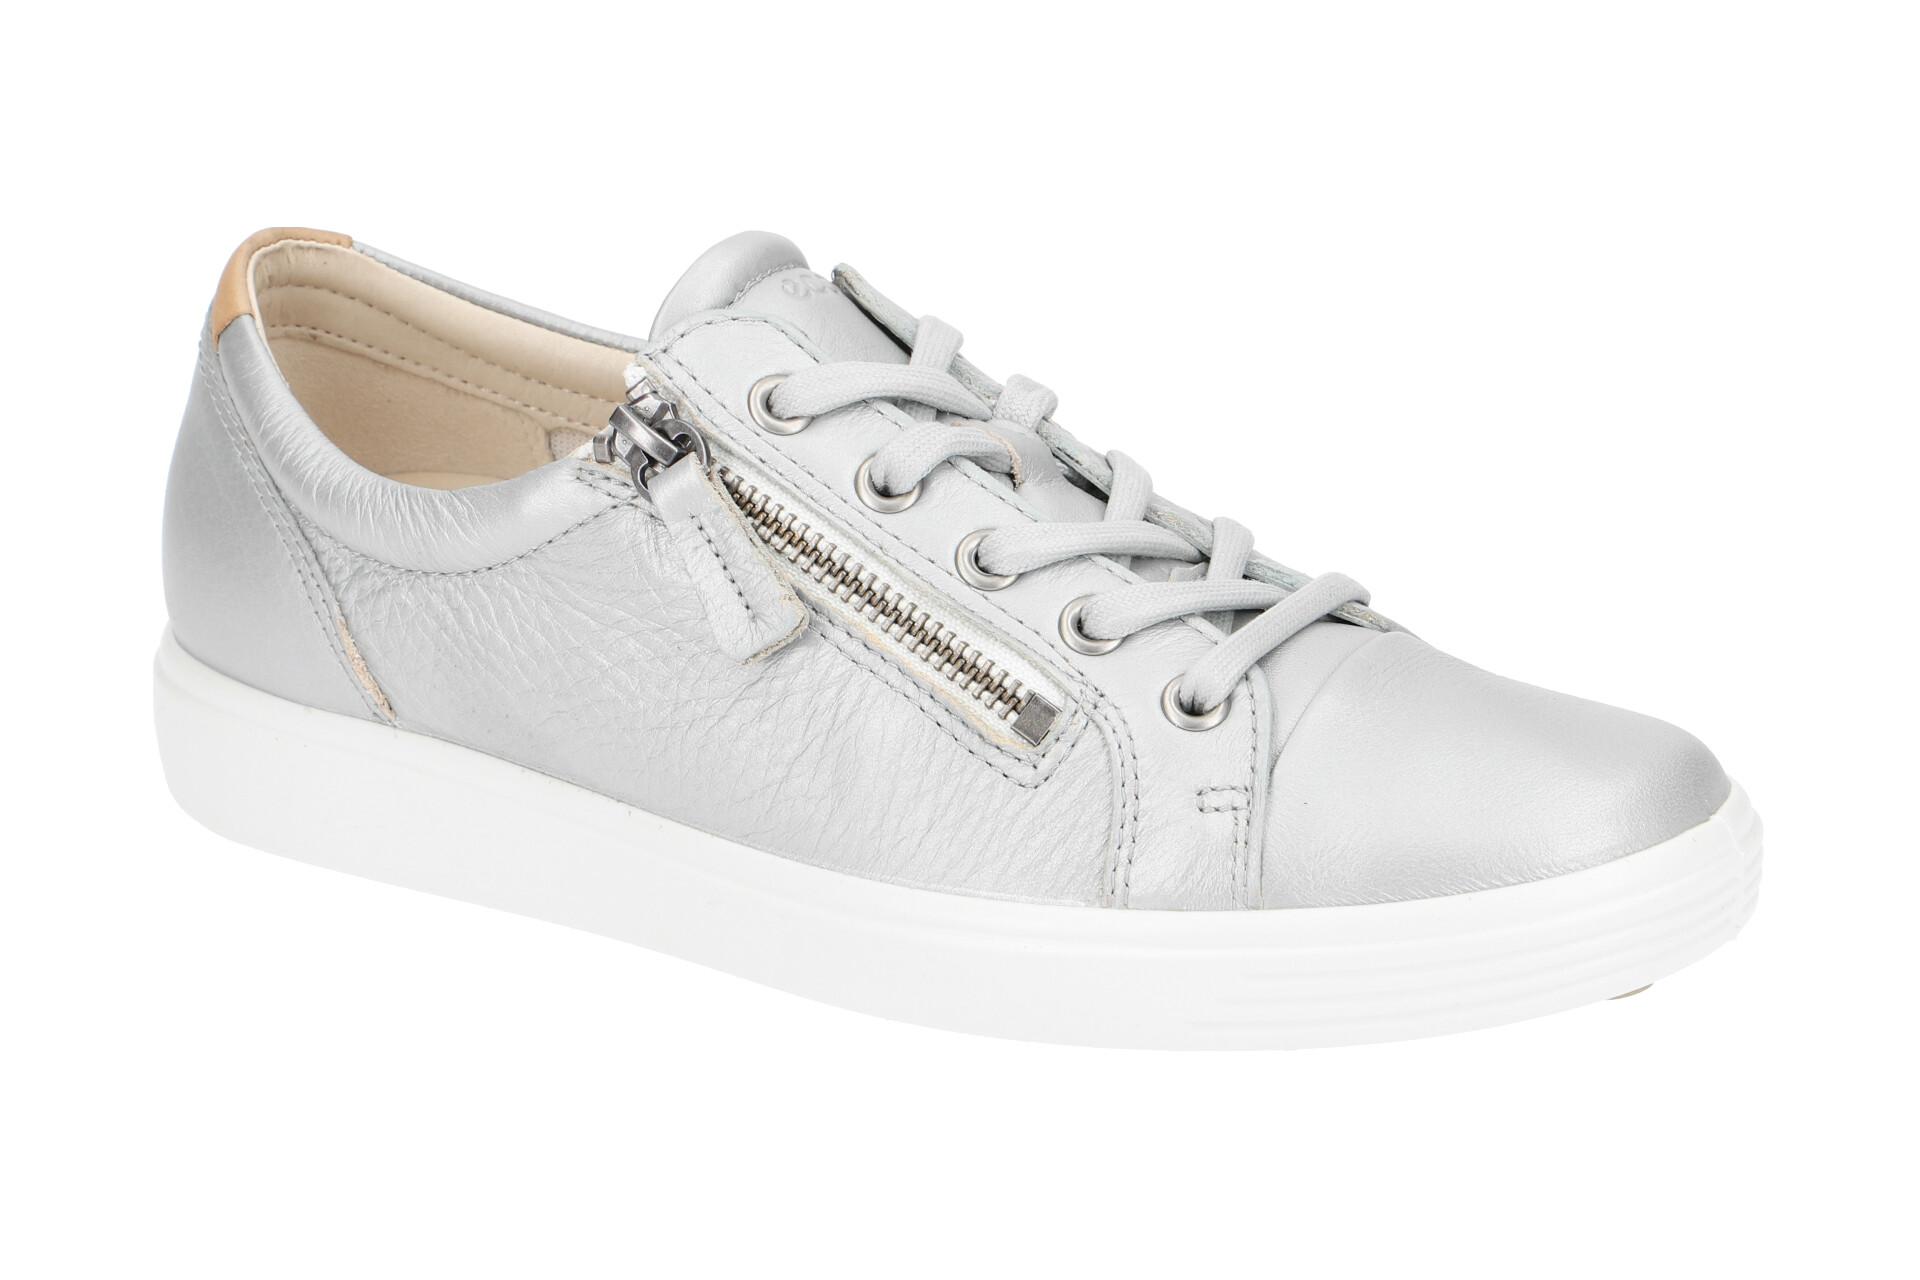 09f1b983017c1c Ecco Soft 7 Damen Schuhe grau metallic - Schuhhaus Strauch Shop